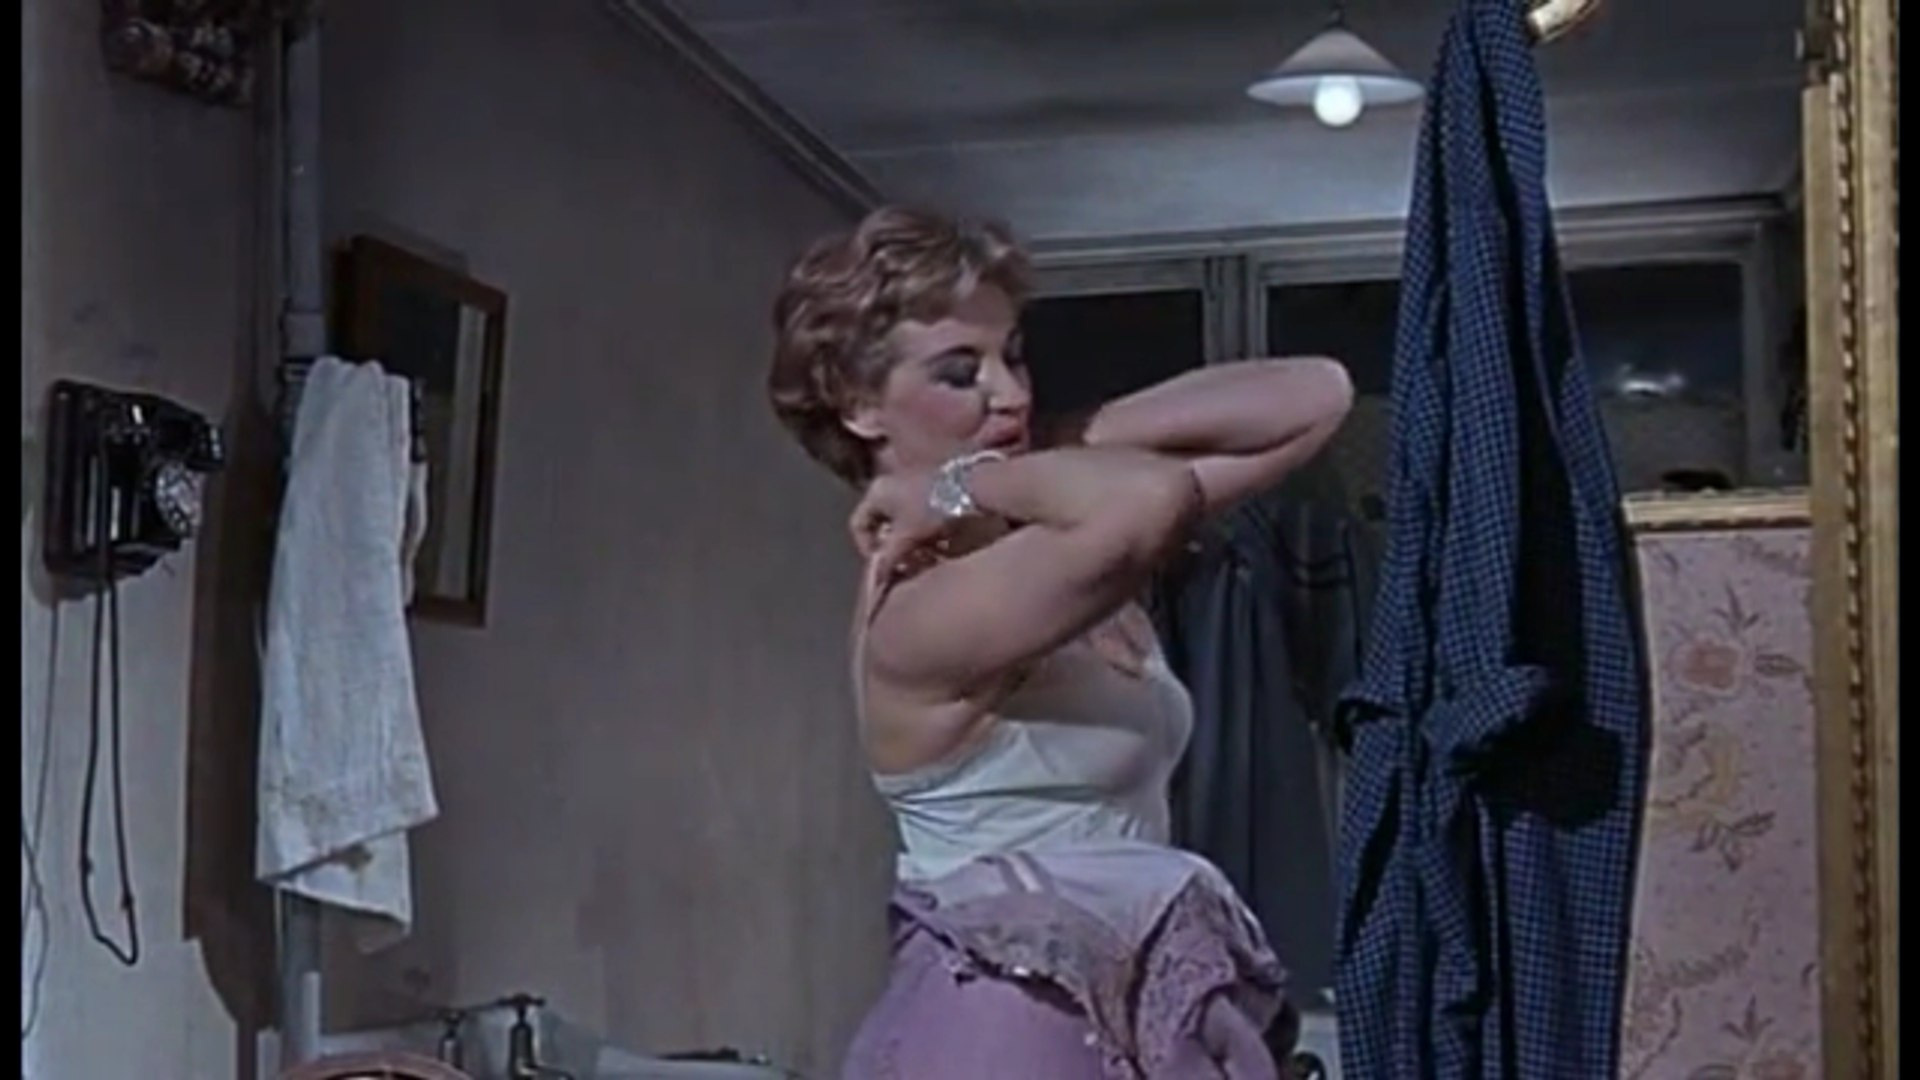 Tunes of Glory (1960) - Alec Guinness, John Mills, Susannah York - Trailer (Drama)